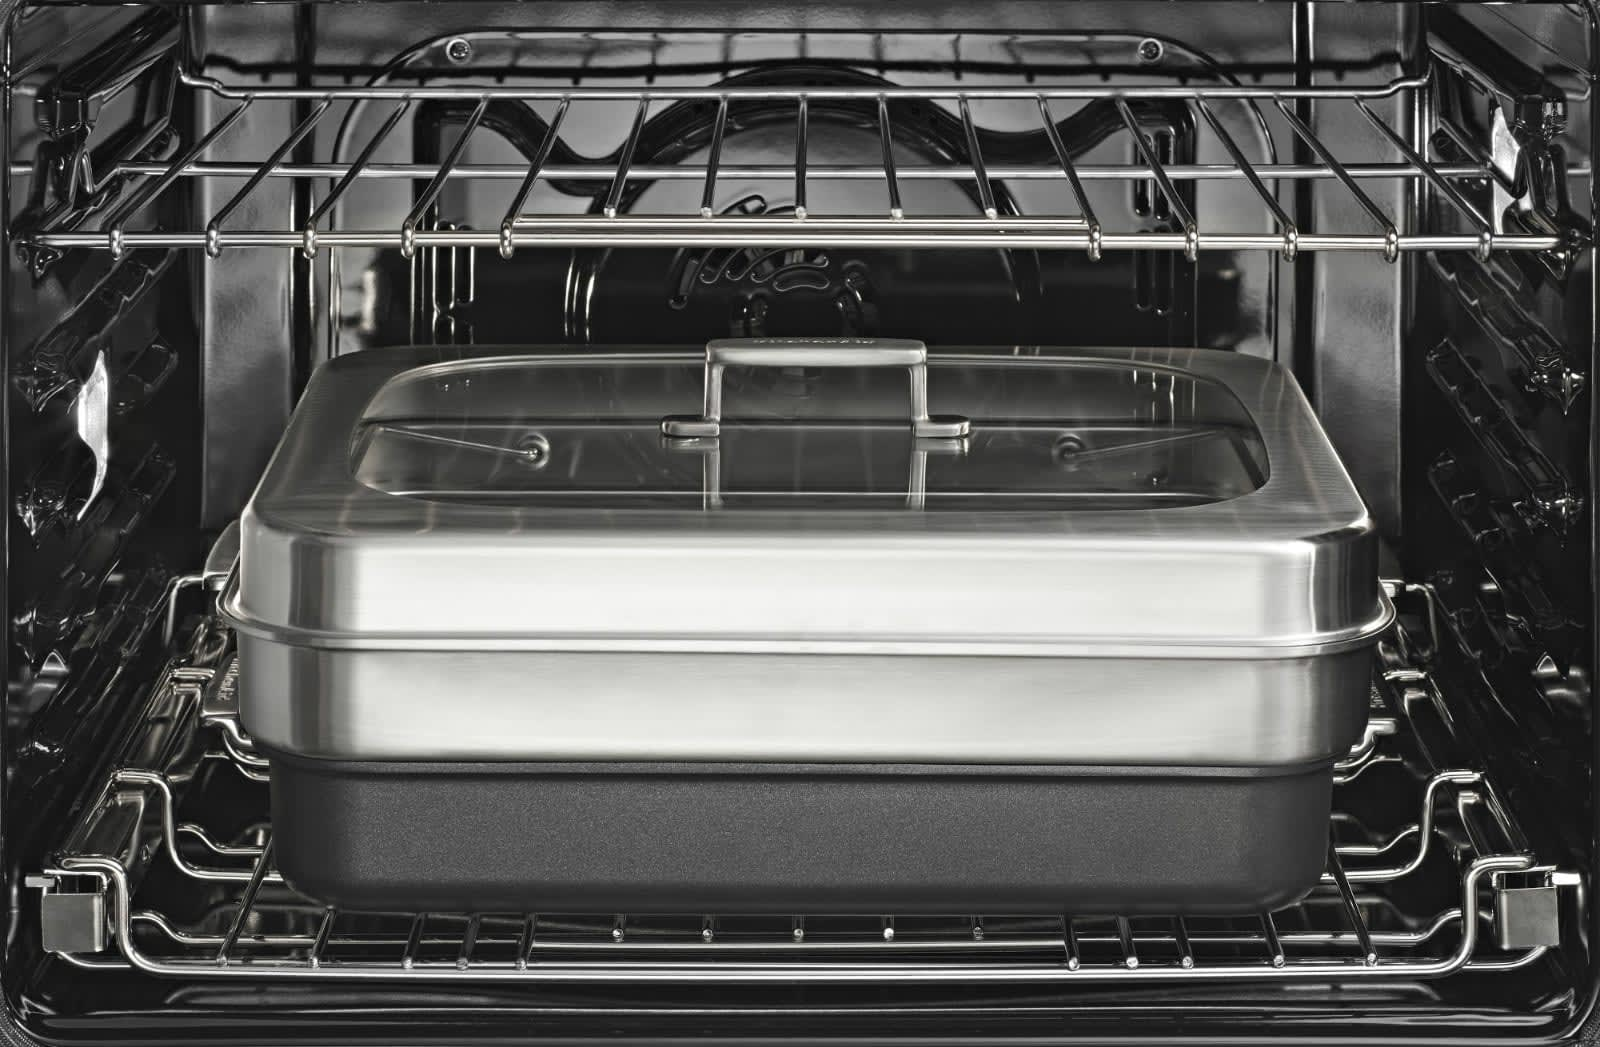 KitchenAid's $3,199 SmartOven+ connects to Google Home and Alexa